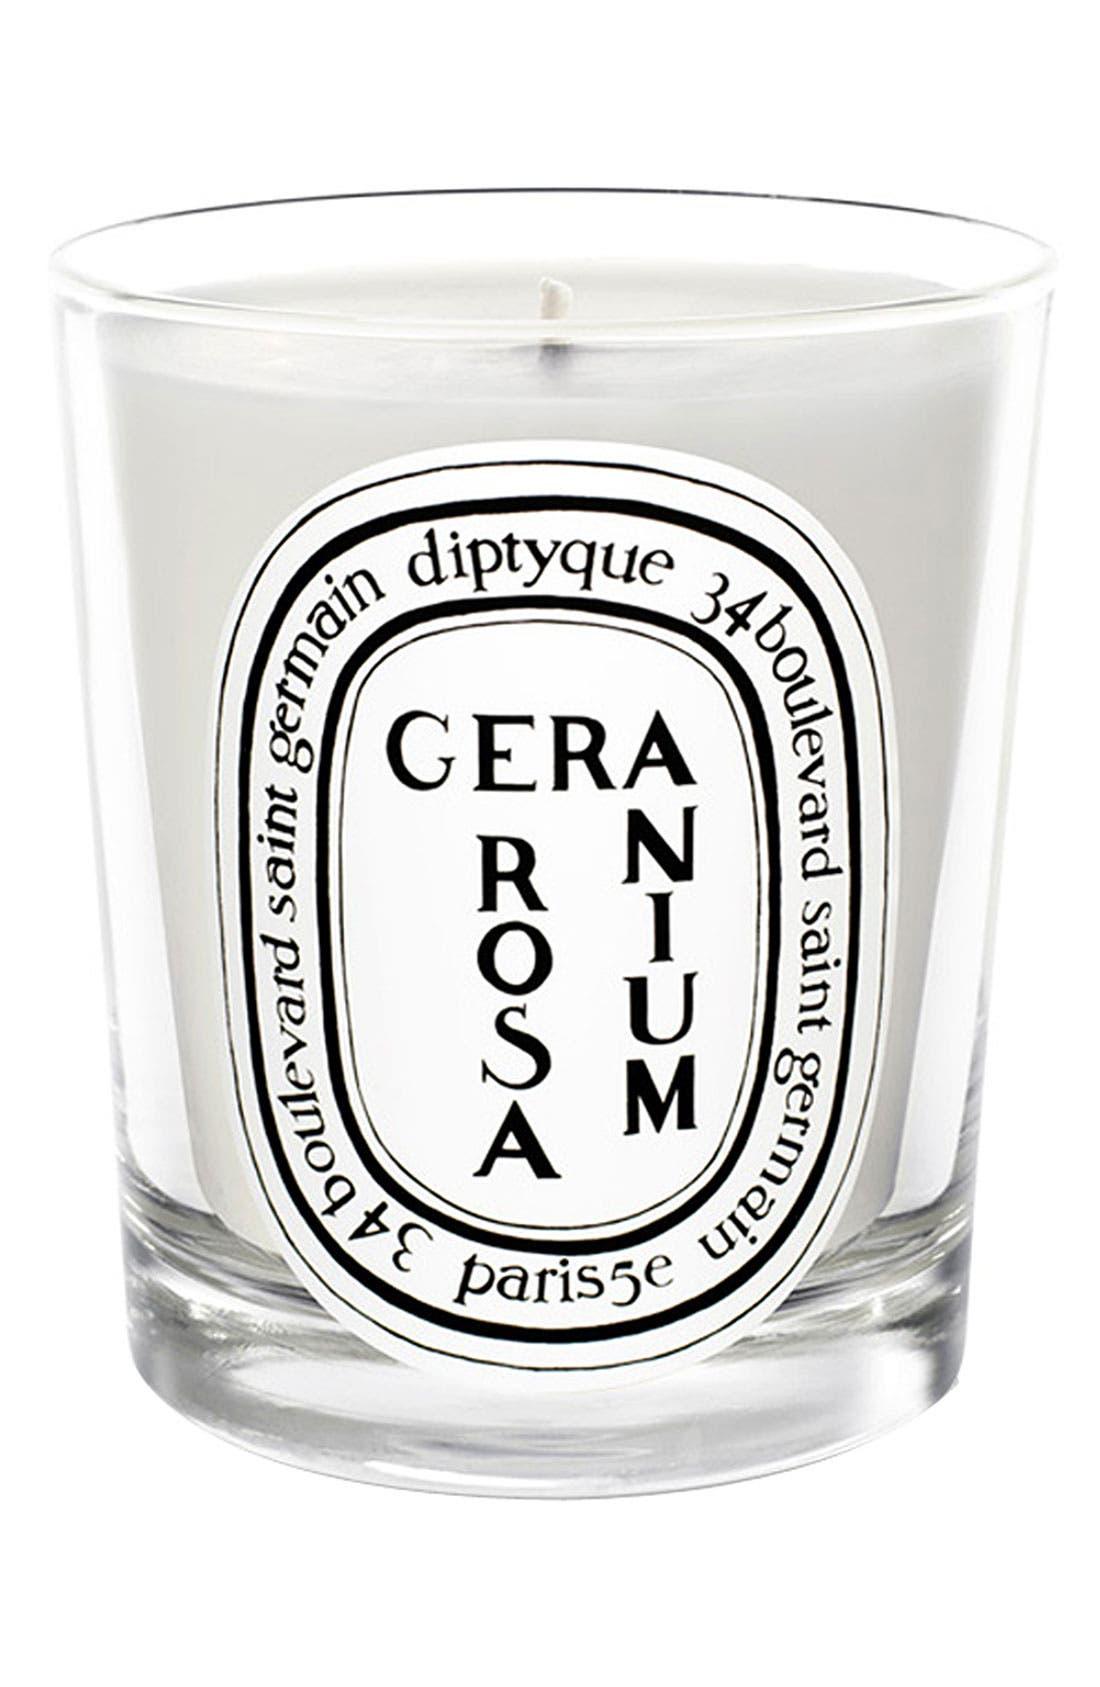 Geranium Rosa/Rose Geranium Scented Candle,                             Main thumbnail 1, color,